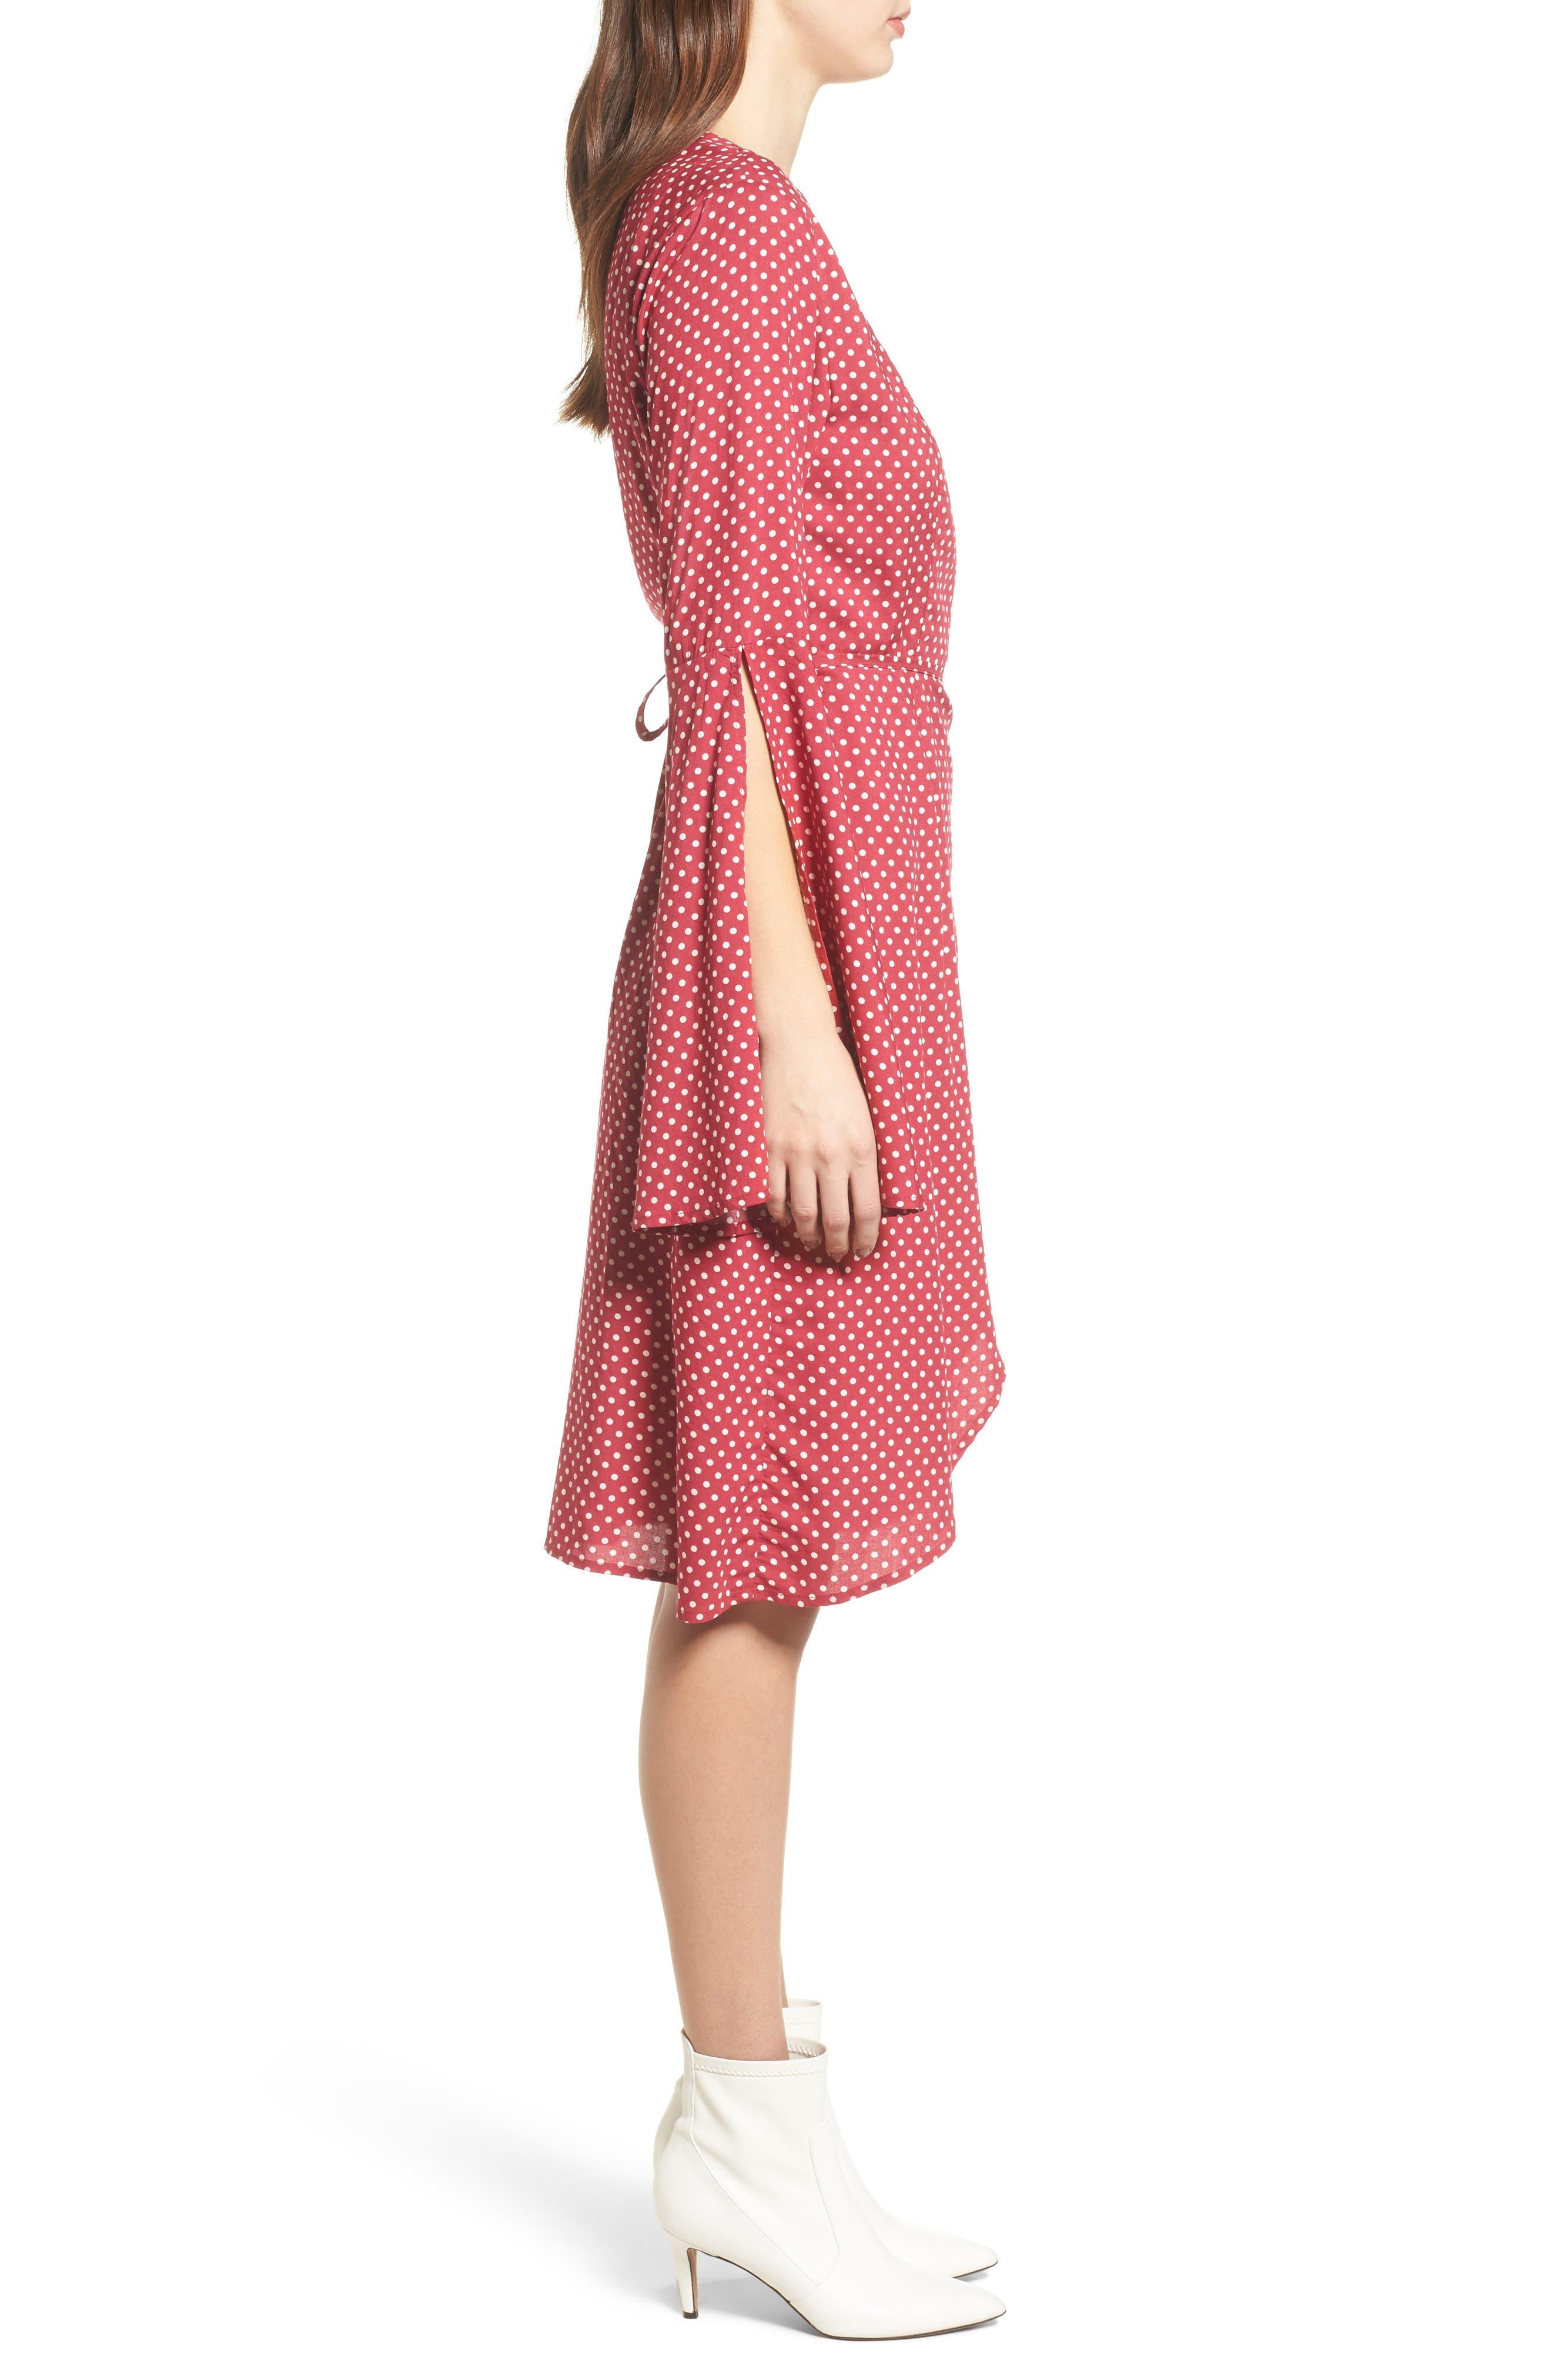 Fearless Polka Dot Wrap Dress,                             Alternate thumbnail 4, color,                             Multi Red